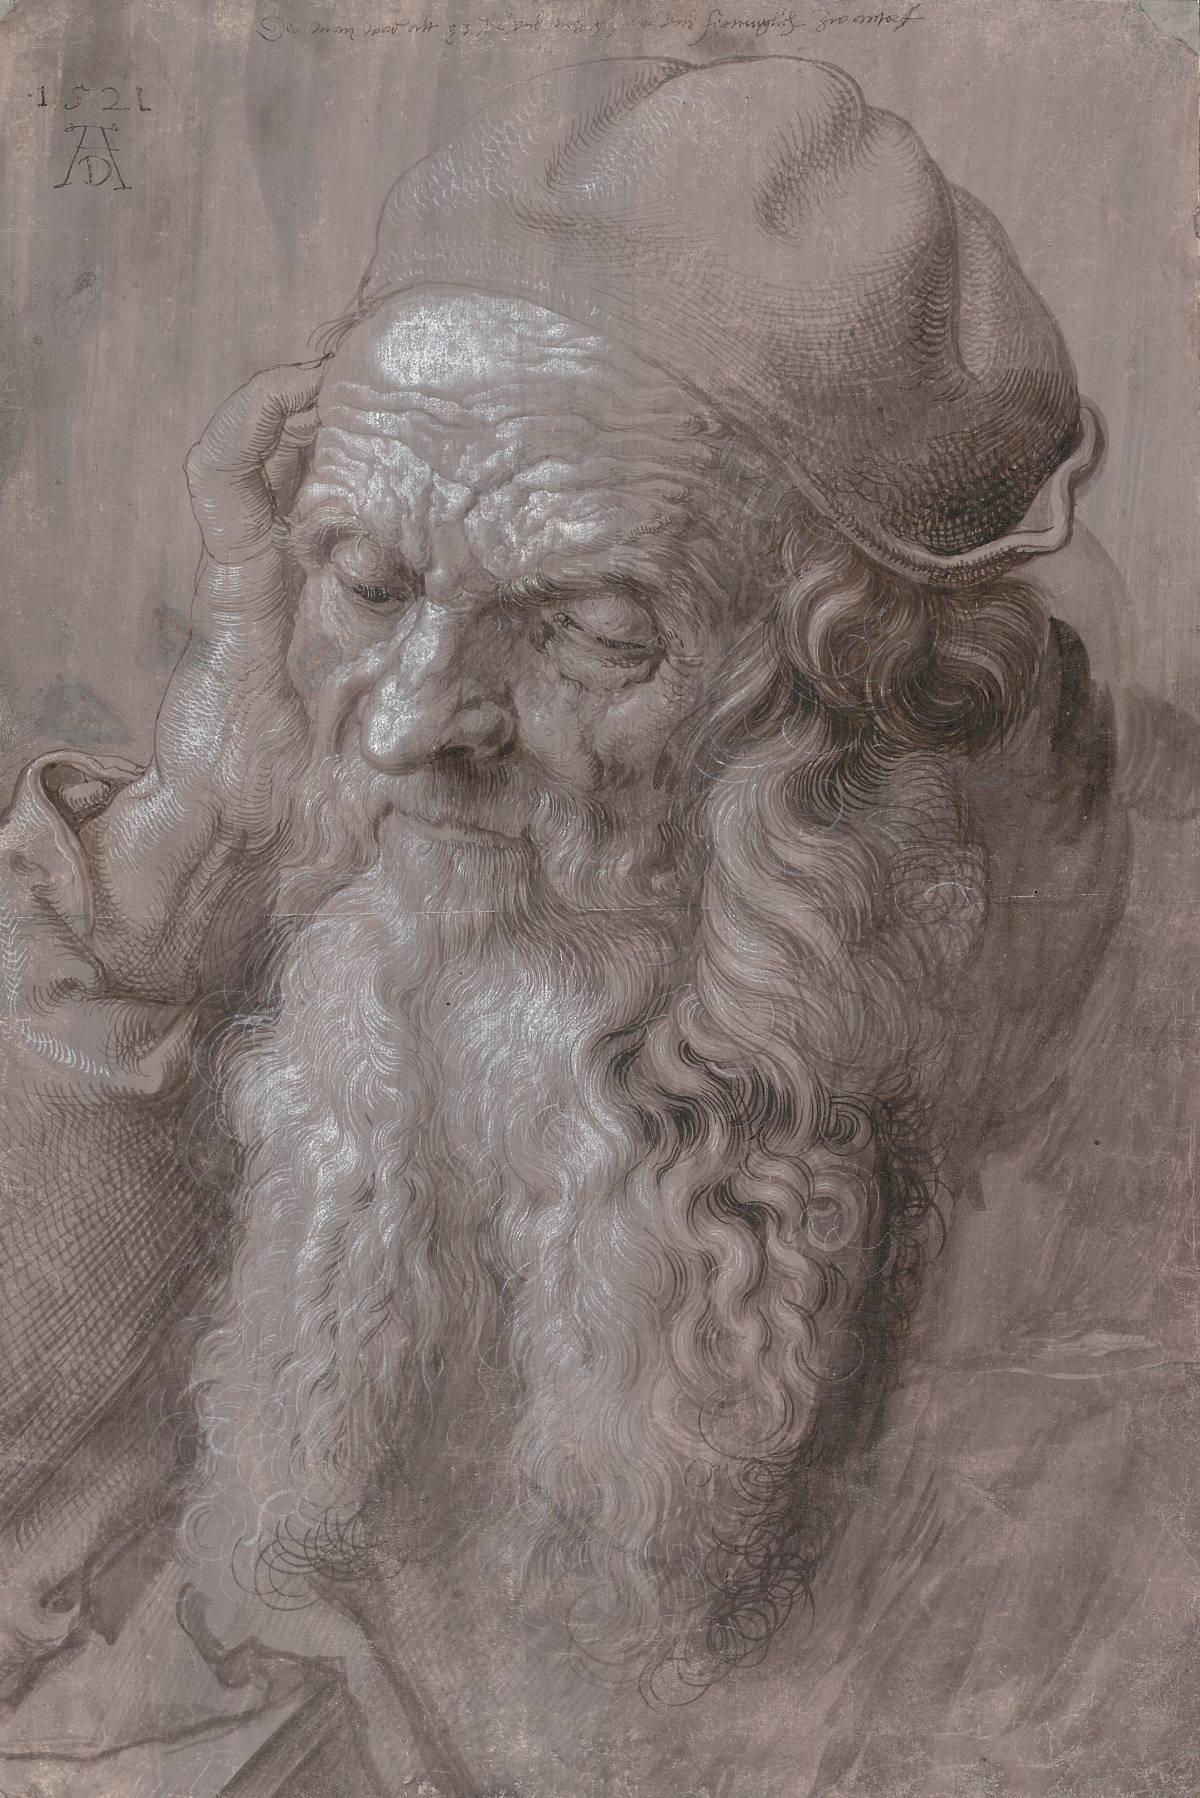 Albrecht Durer: un uomo di novantatré anni, 1521